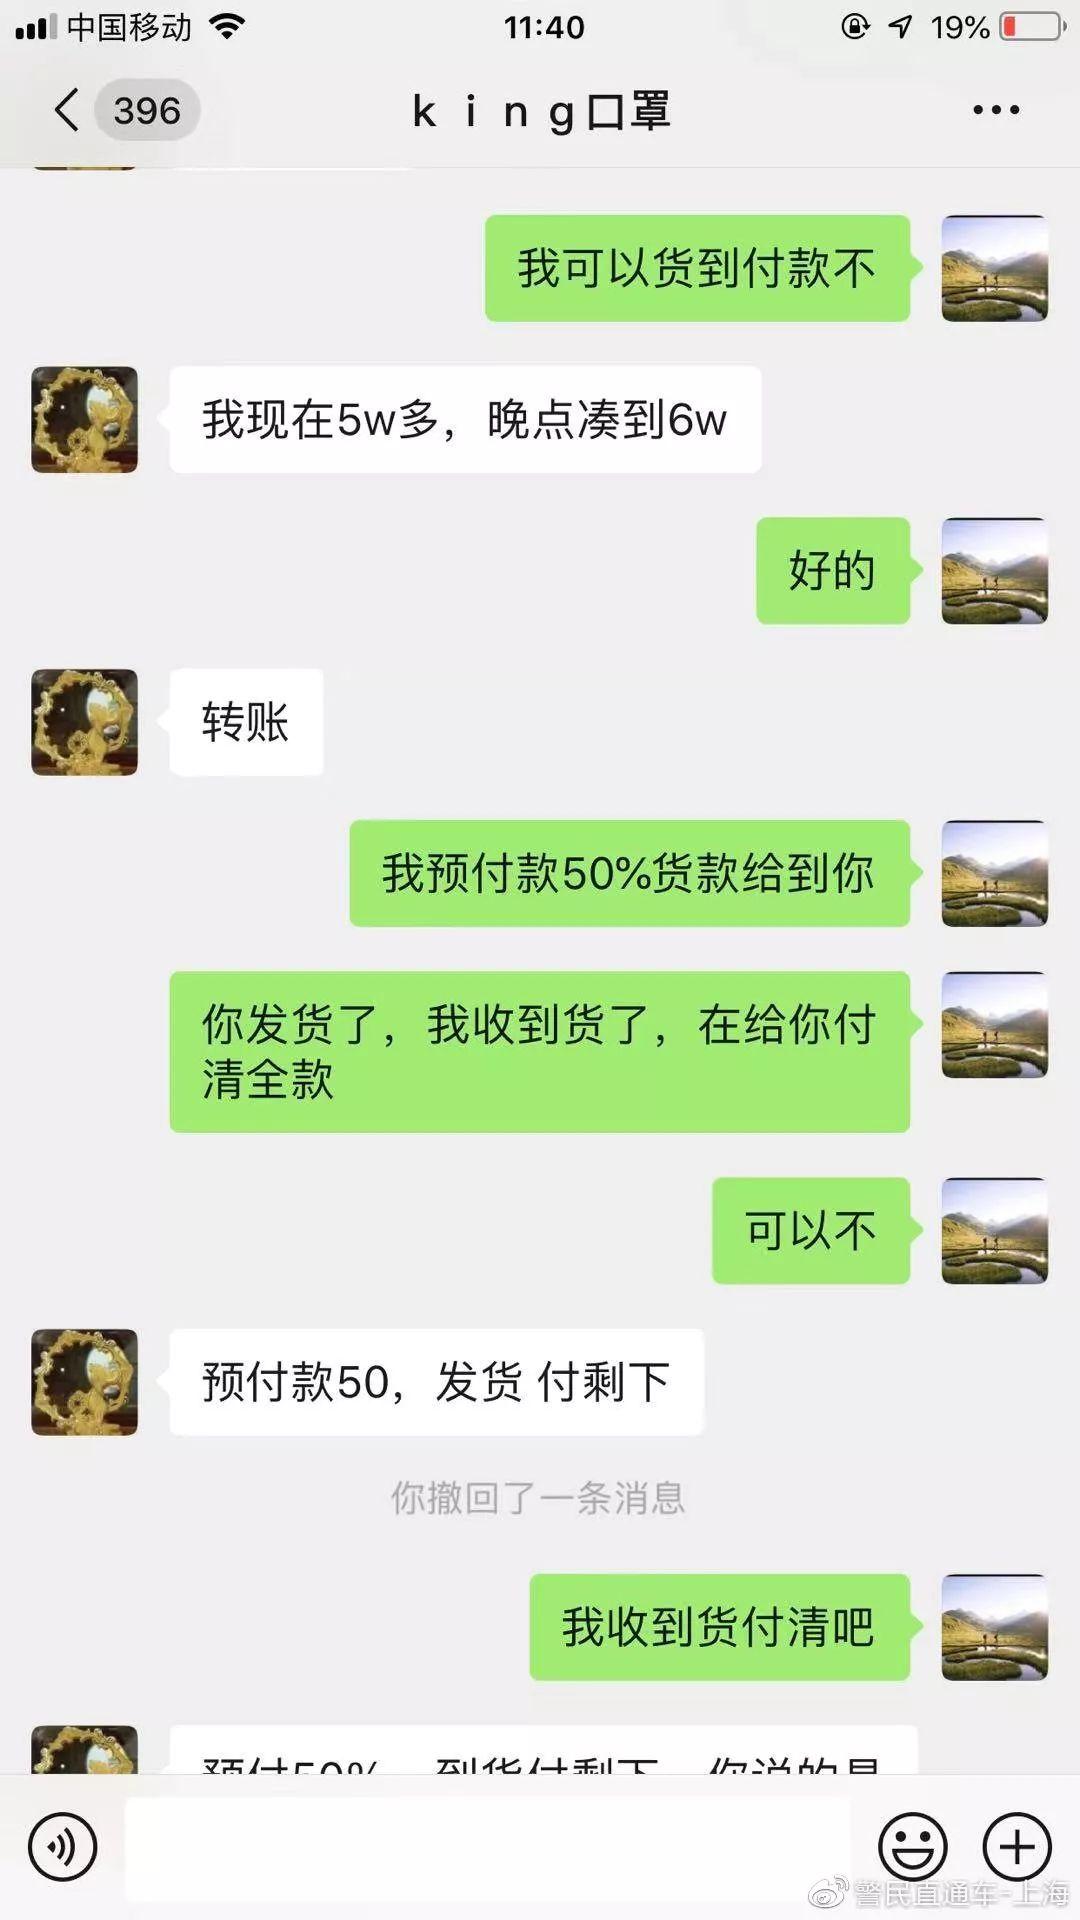 http://www.gyw007.com/nanhaifangchan/455265.html